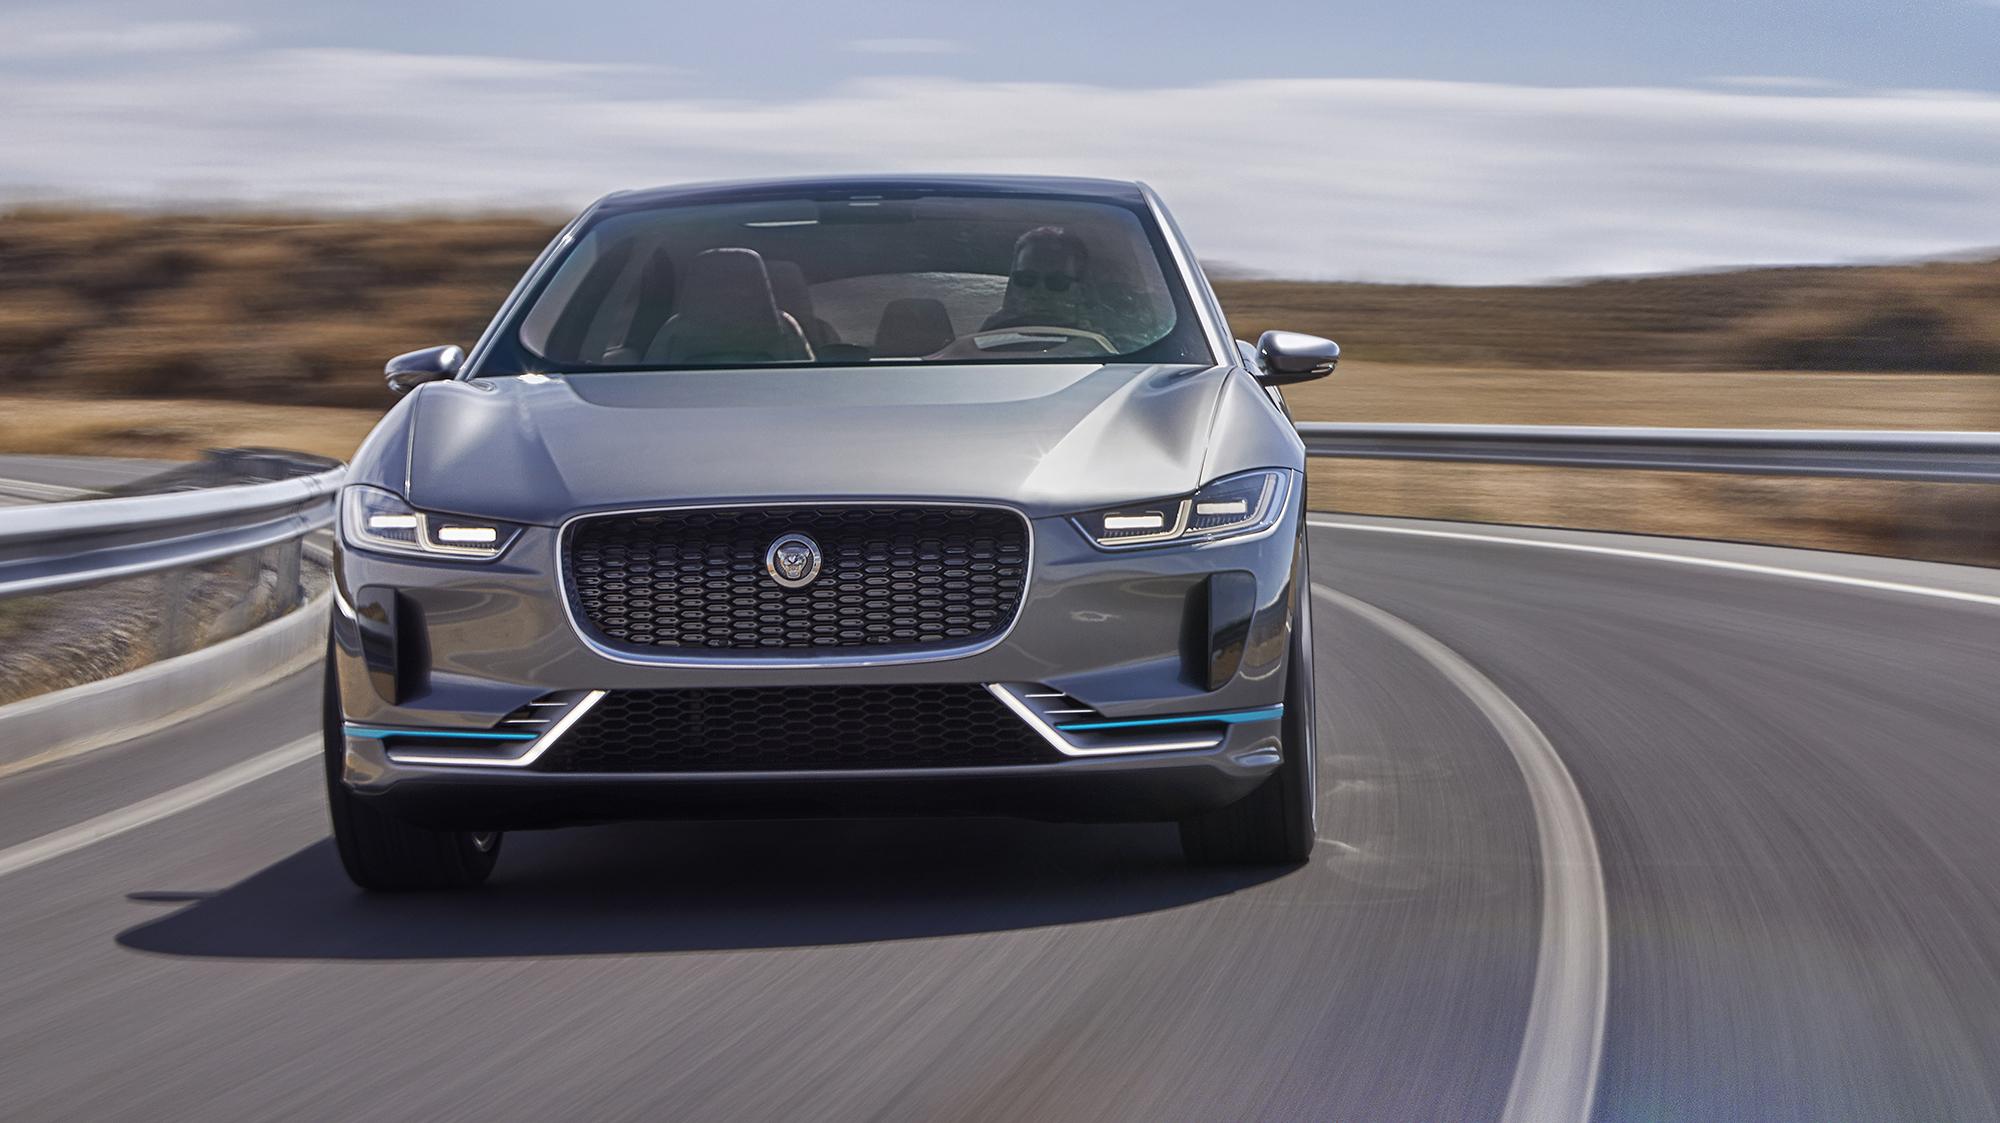 2016 Toyota Supra >> Jaguar I-Pace 'concept' revealed: British luxury brand readies move into EV arena - photos ...